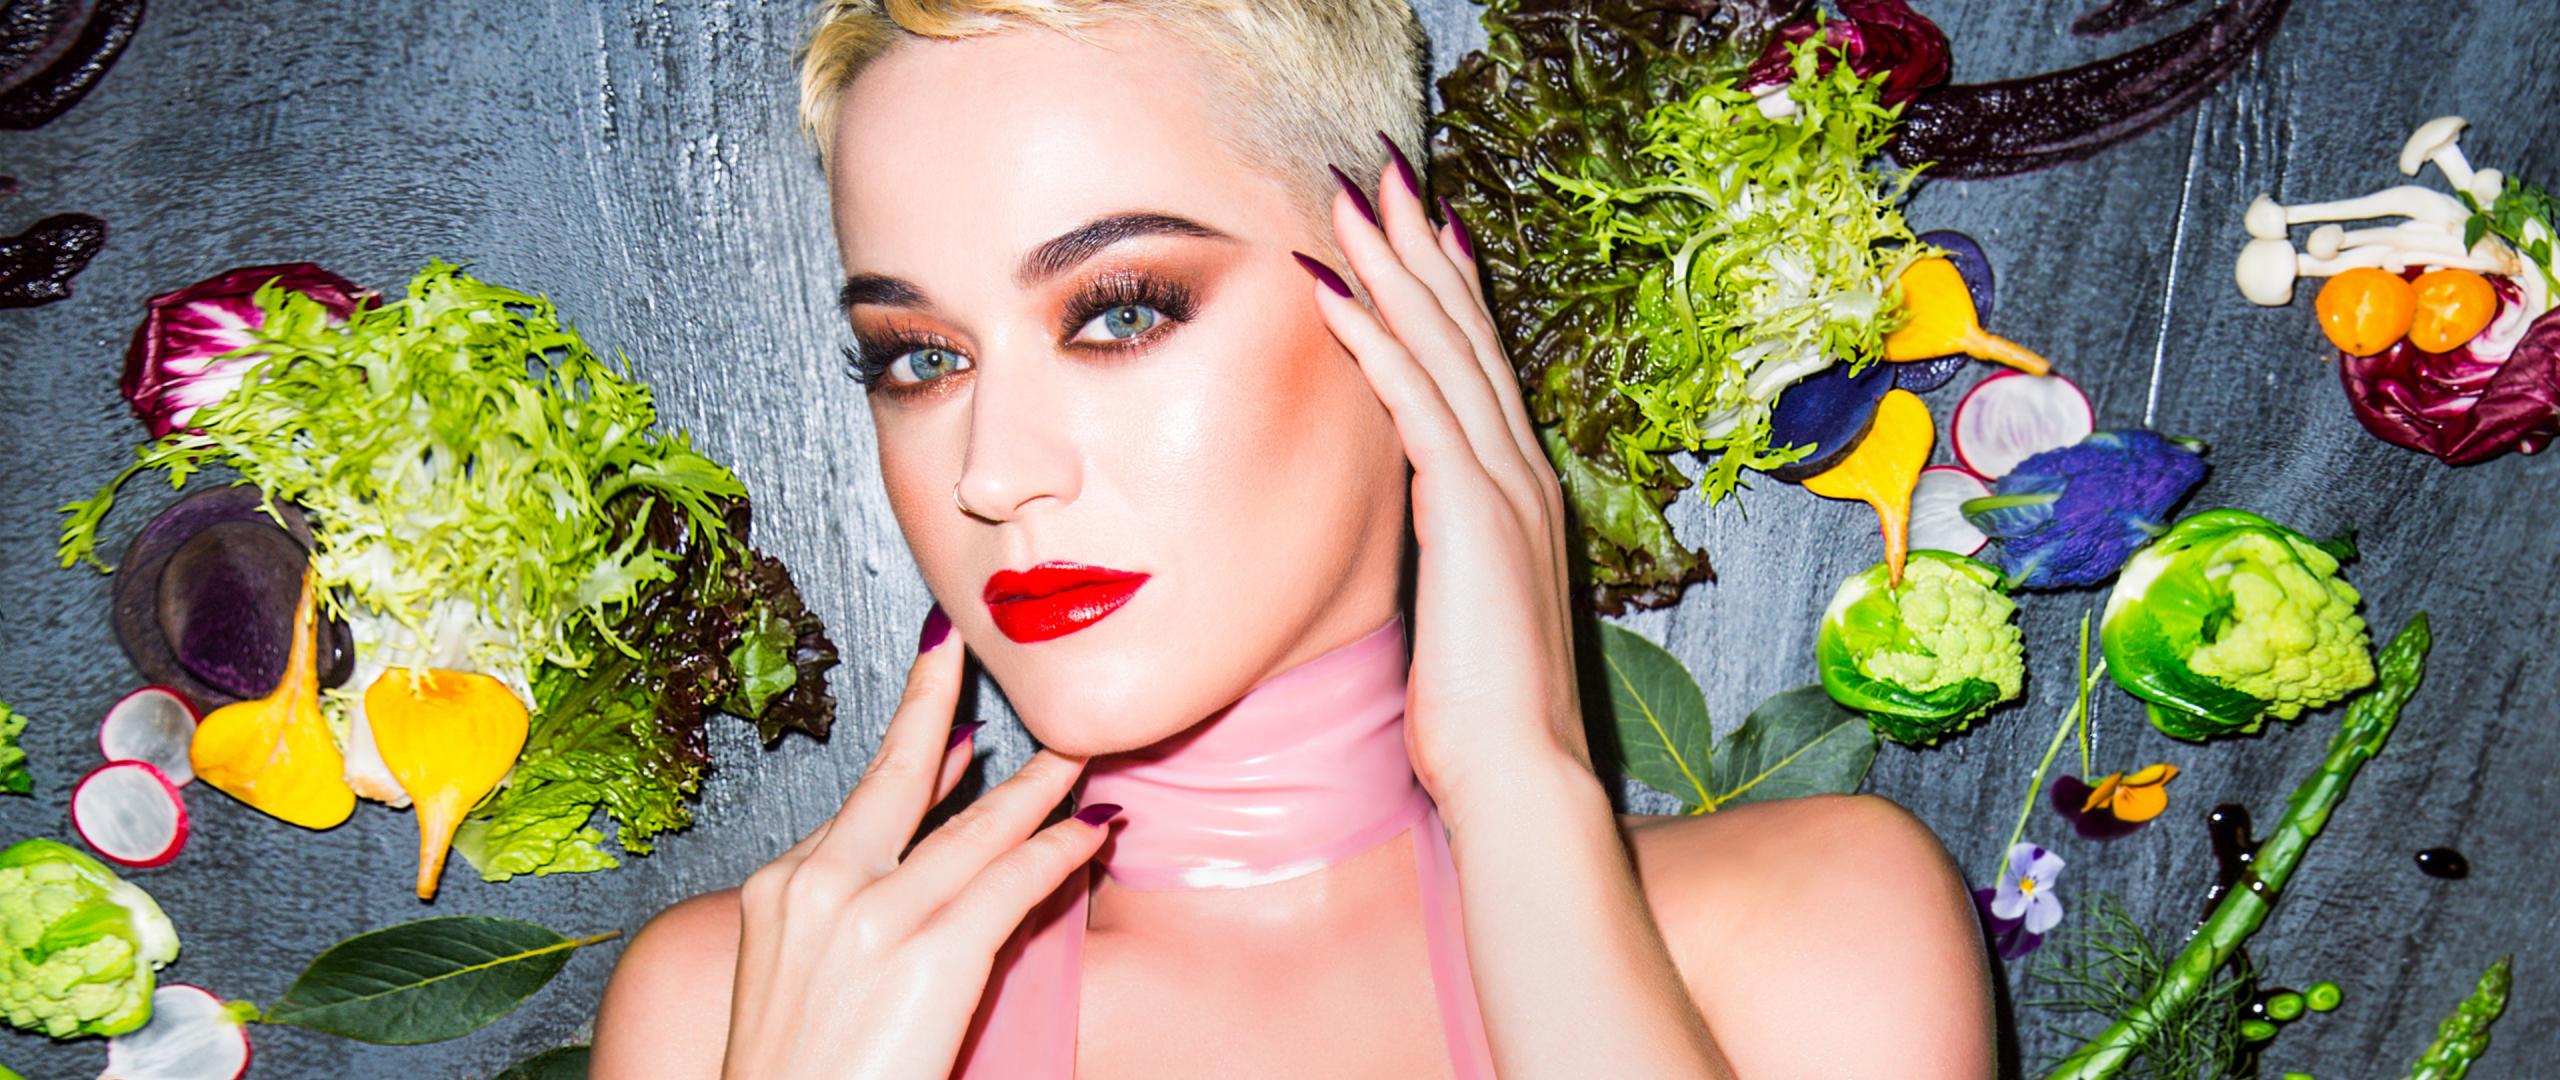 Desktop Wallpaper Katy Perry Short Hair Bon Appetit 4k Hd Image Picture Background 4mlsnj